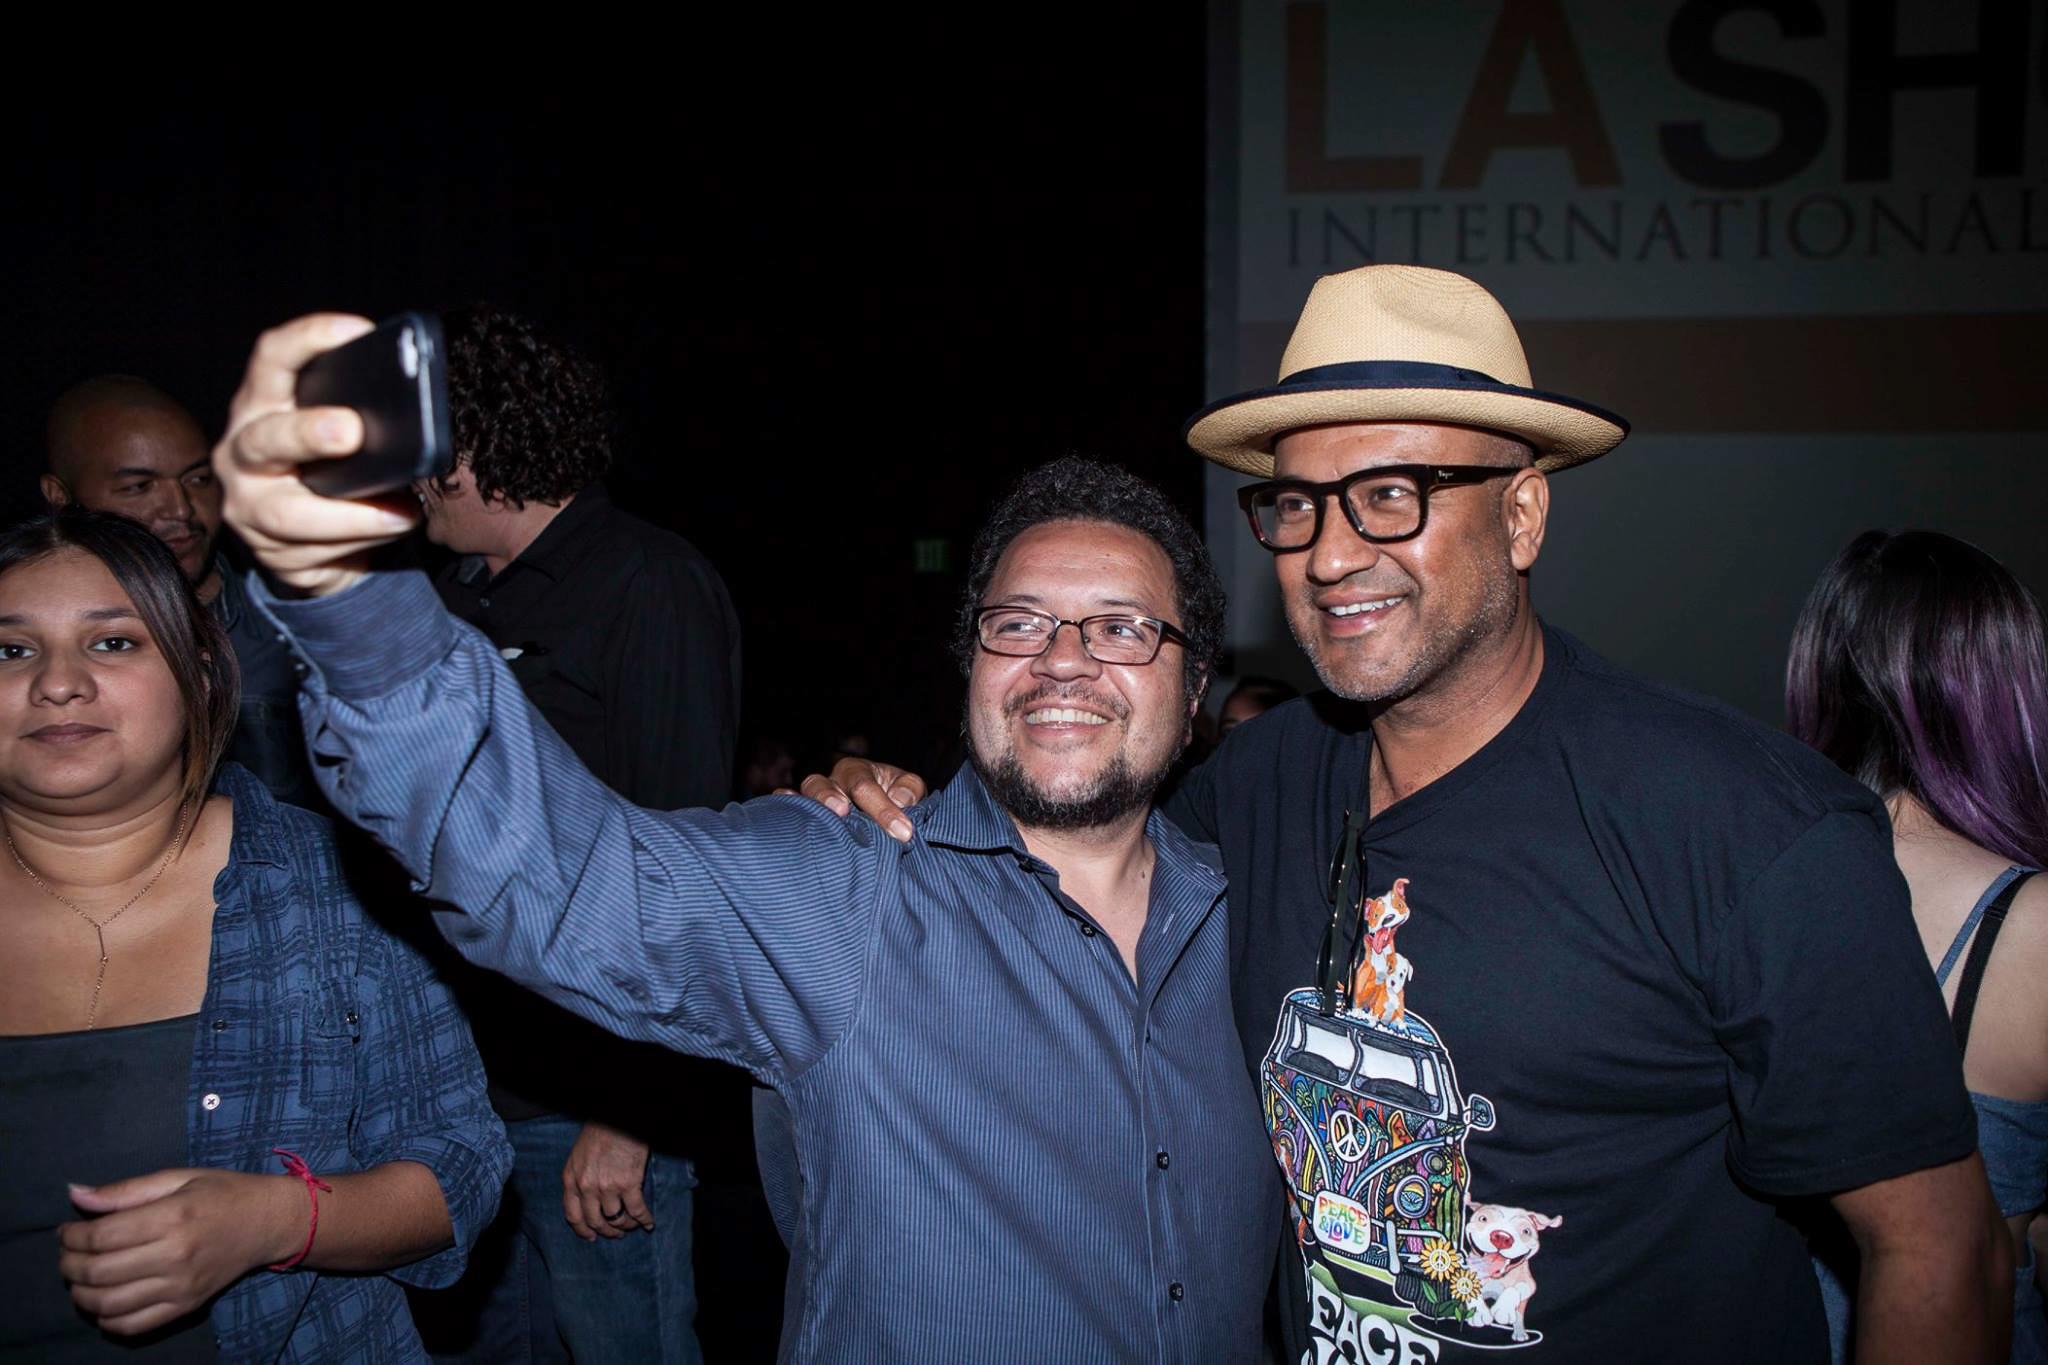 Juan Escobedo and Mario Cortez - Marisol Film at LA Short